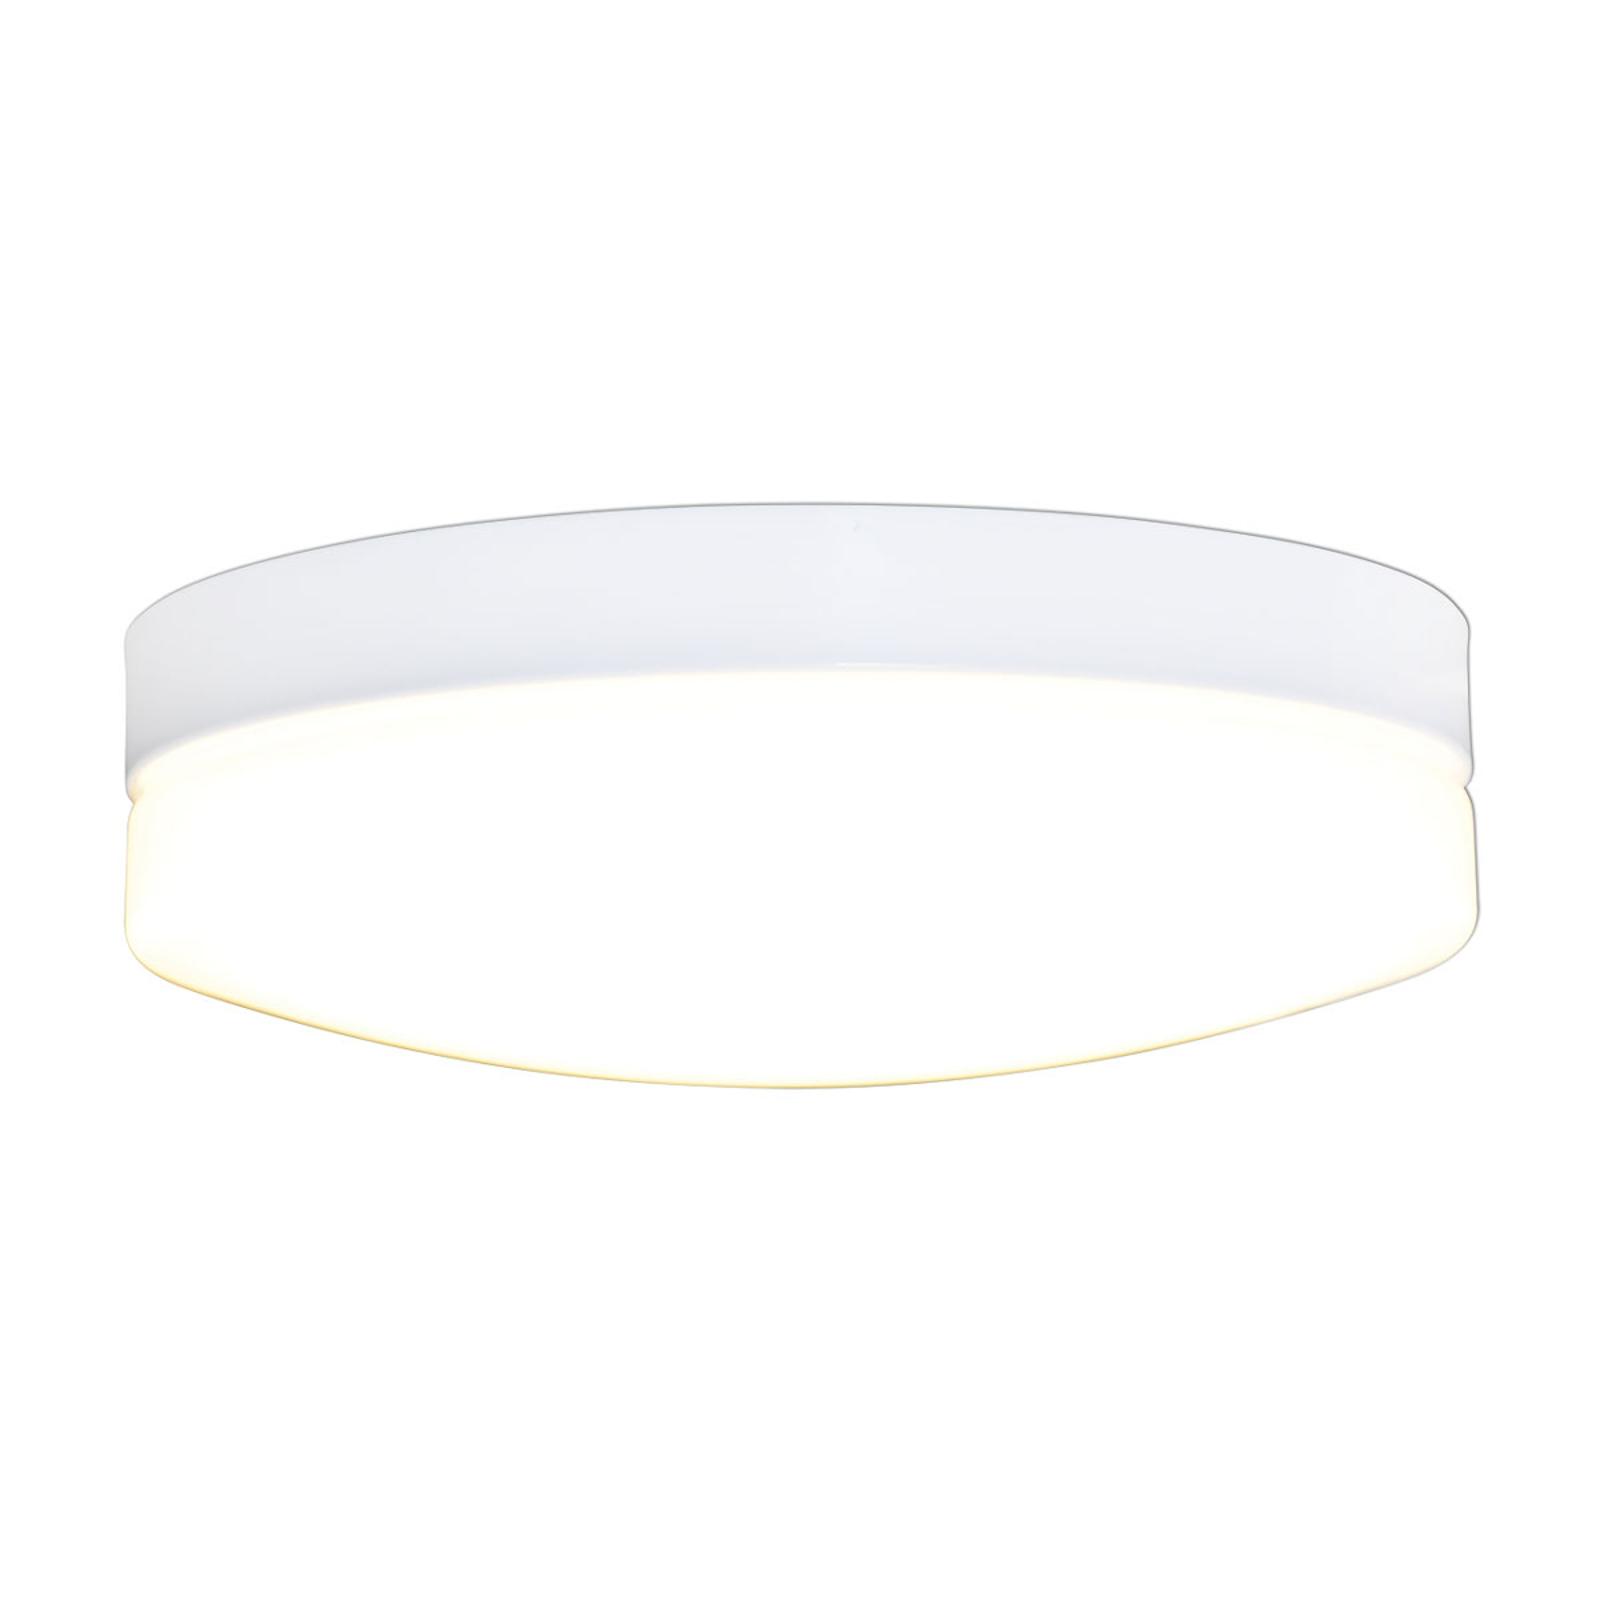 Lampa sufitowa LED Cool, skokowa zmiana barw RGB